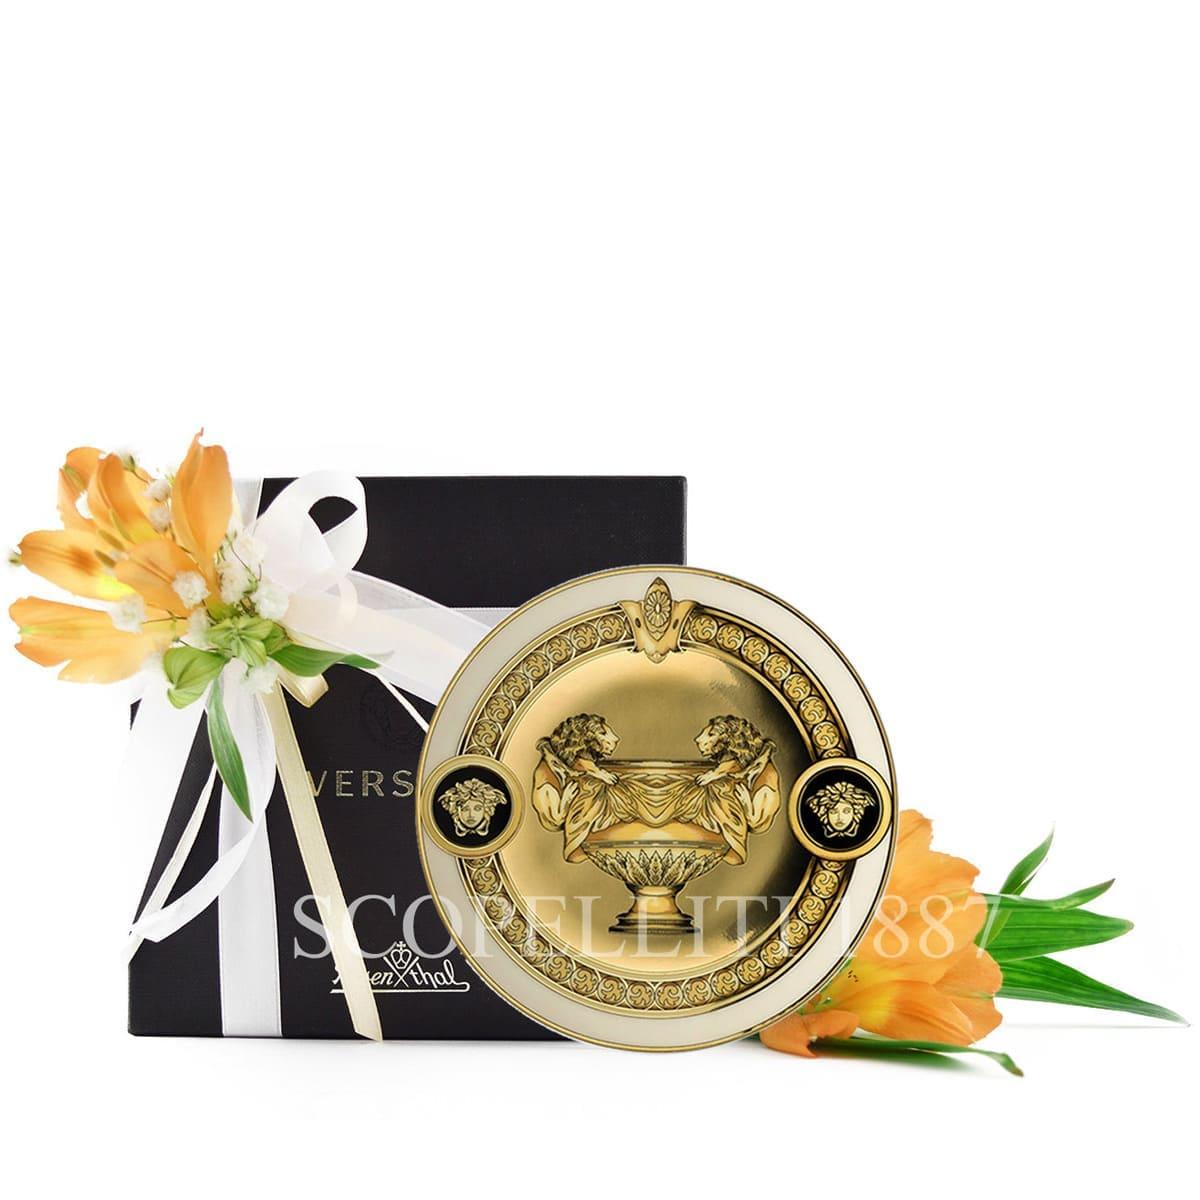 versace italian design prestige gala small plate golden